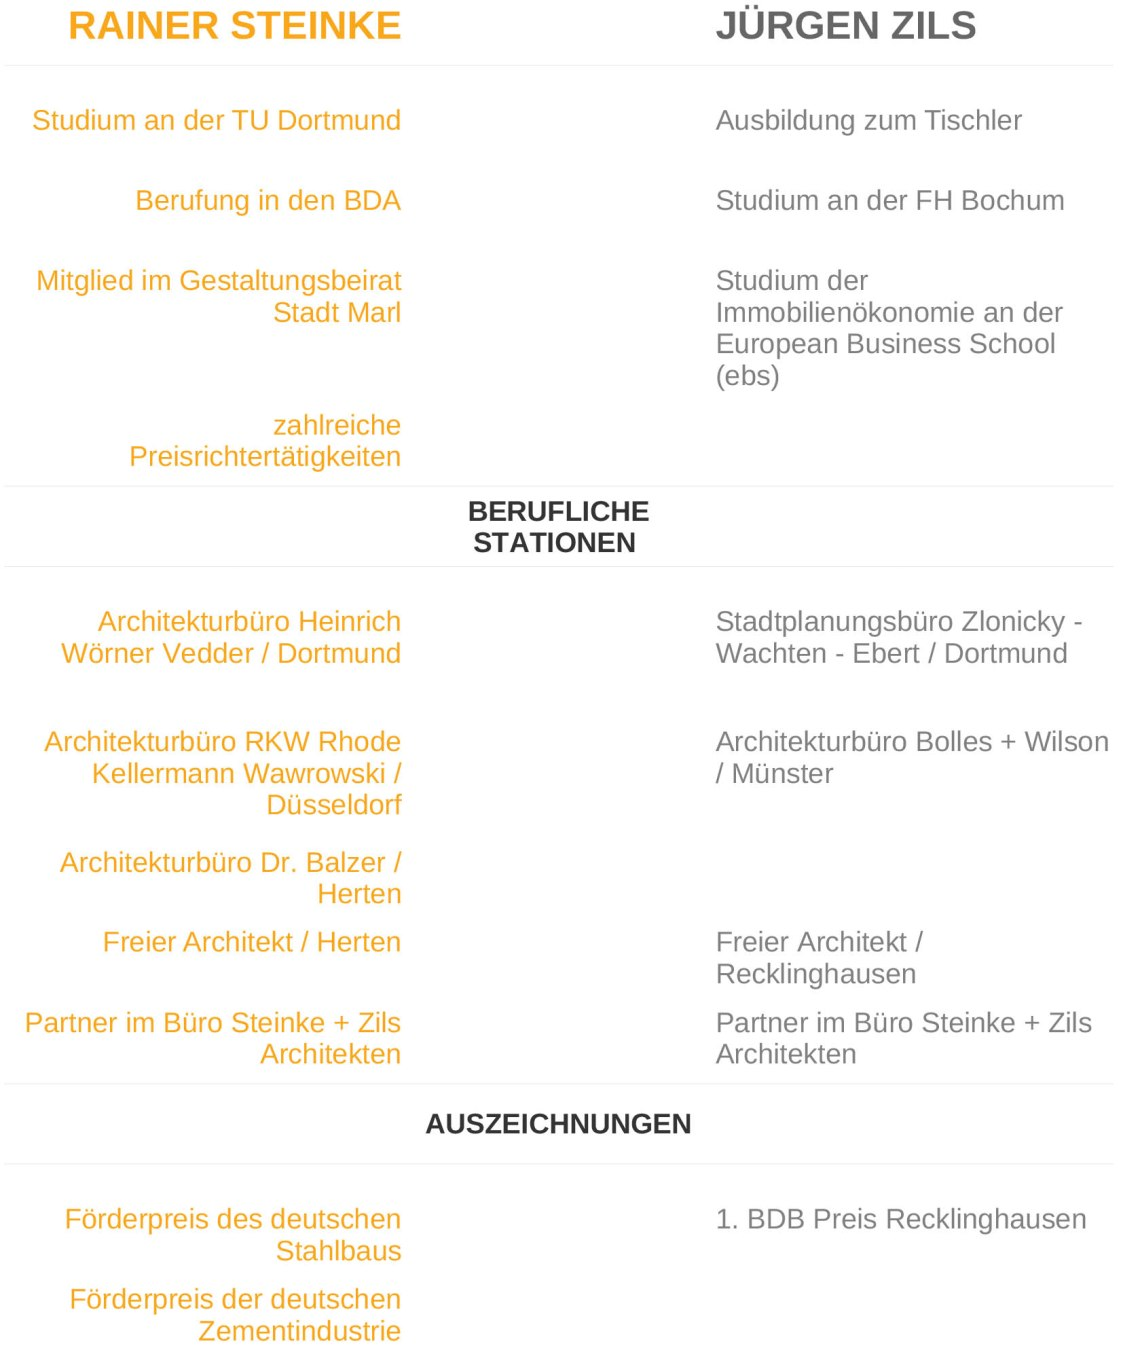 Biografie Steinke+Zils